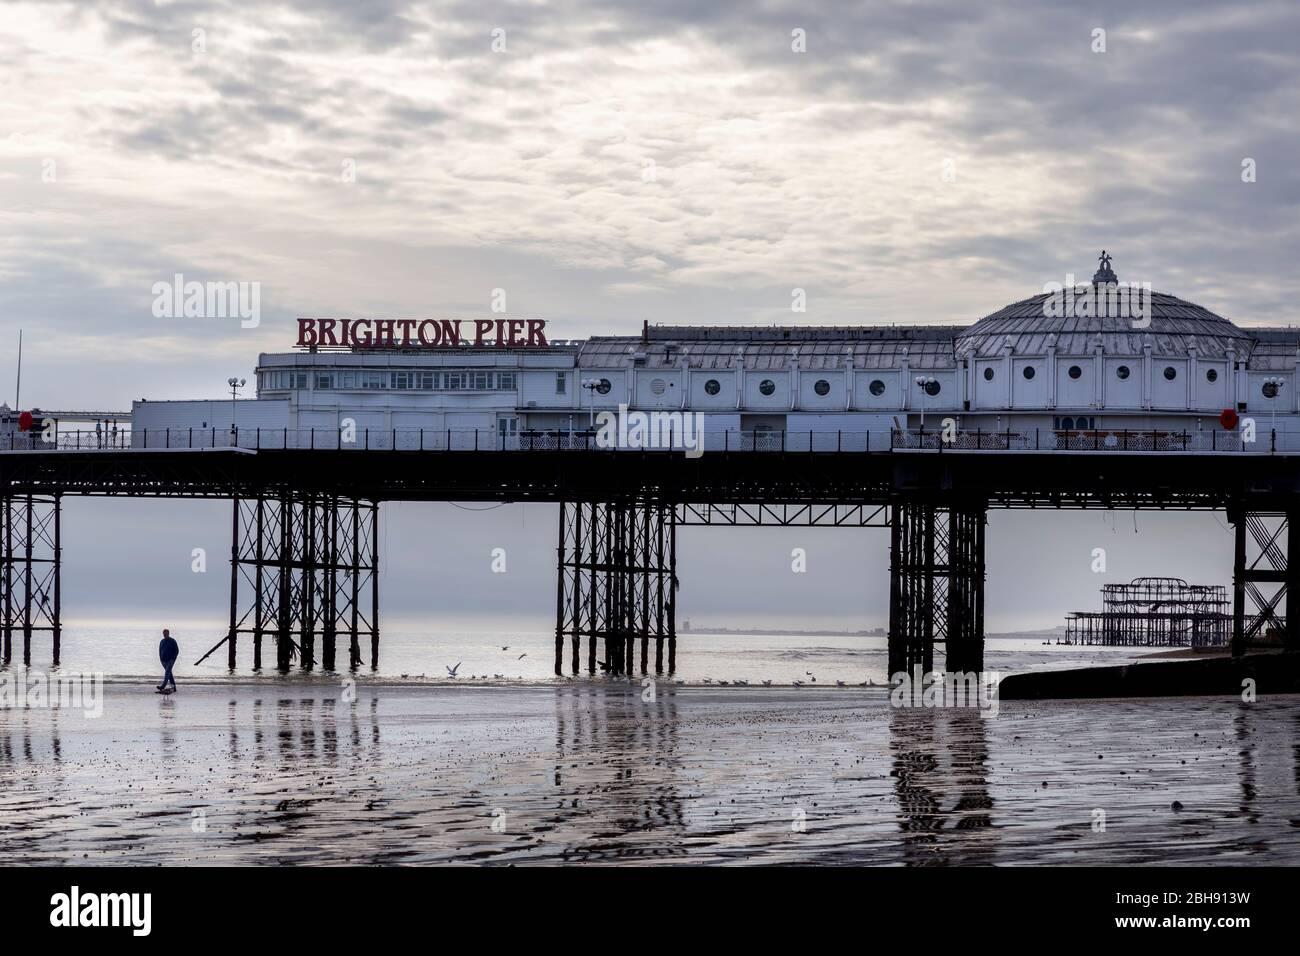 man alone at Brighton pier Stock Photo